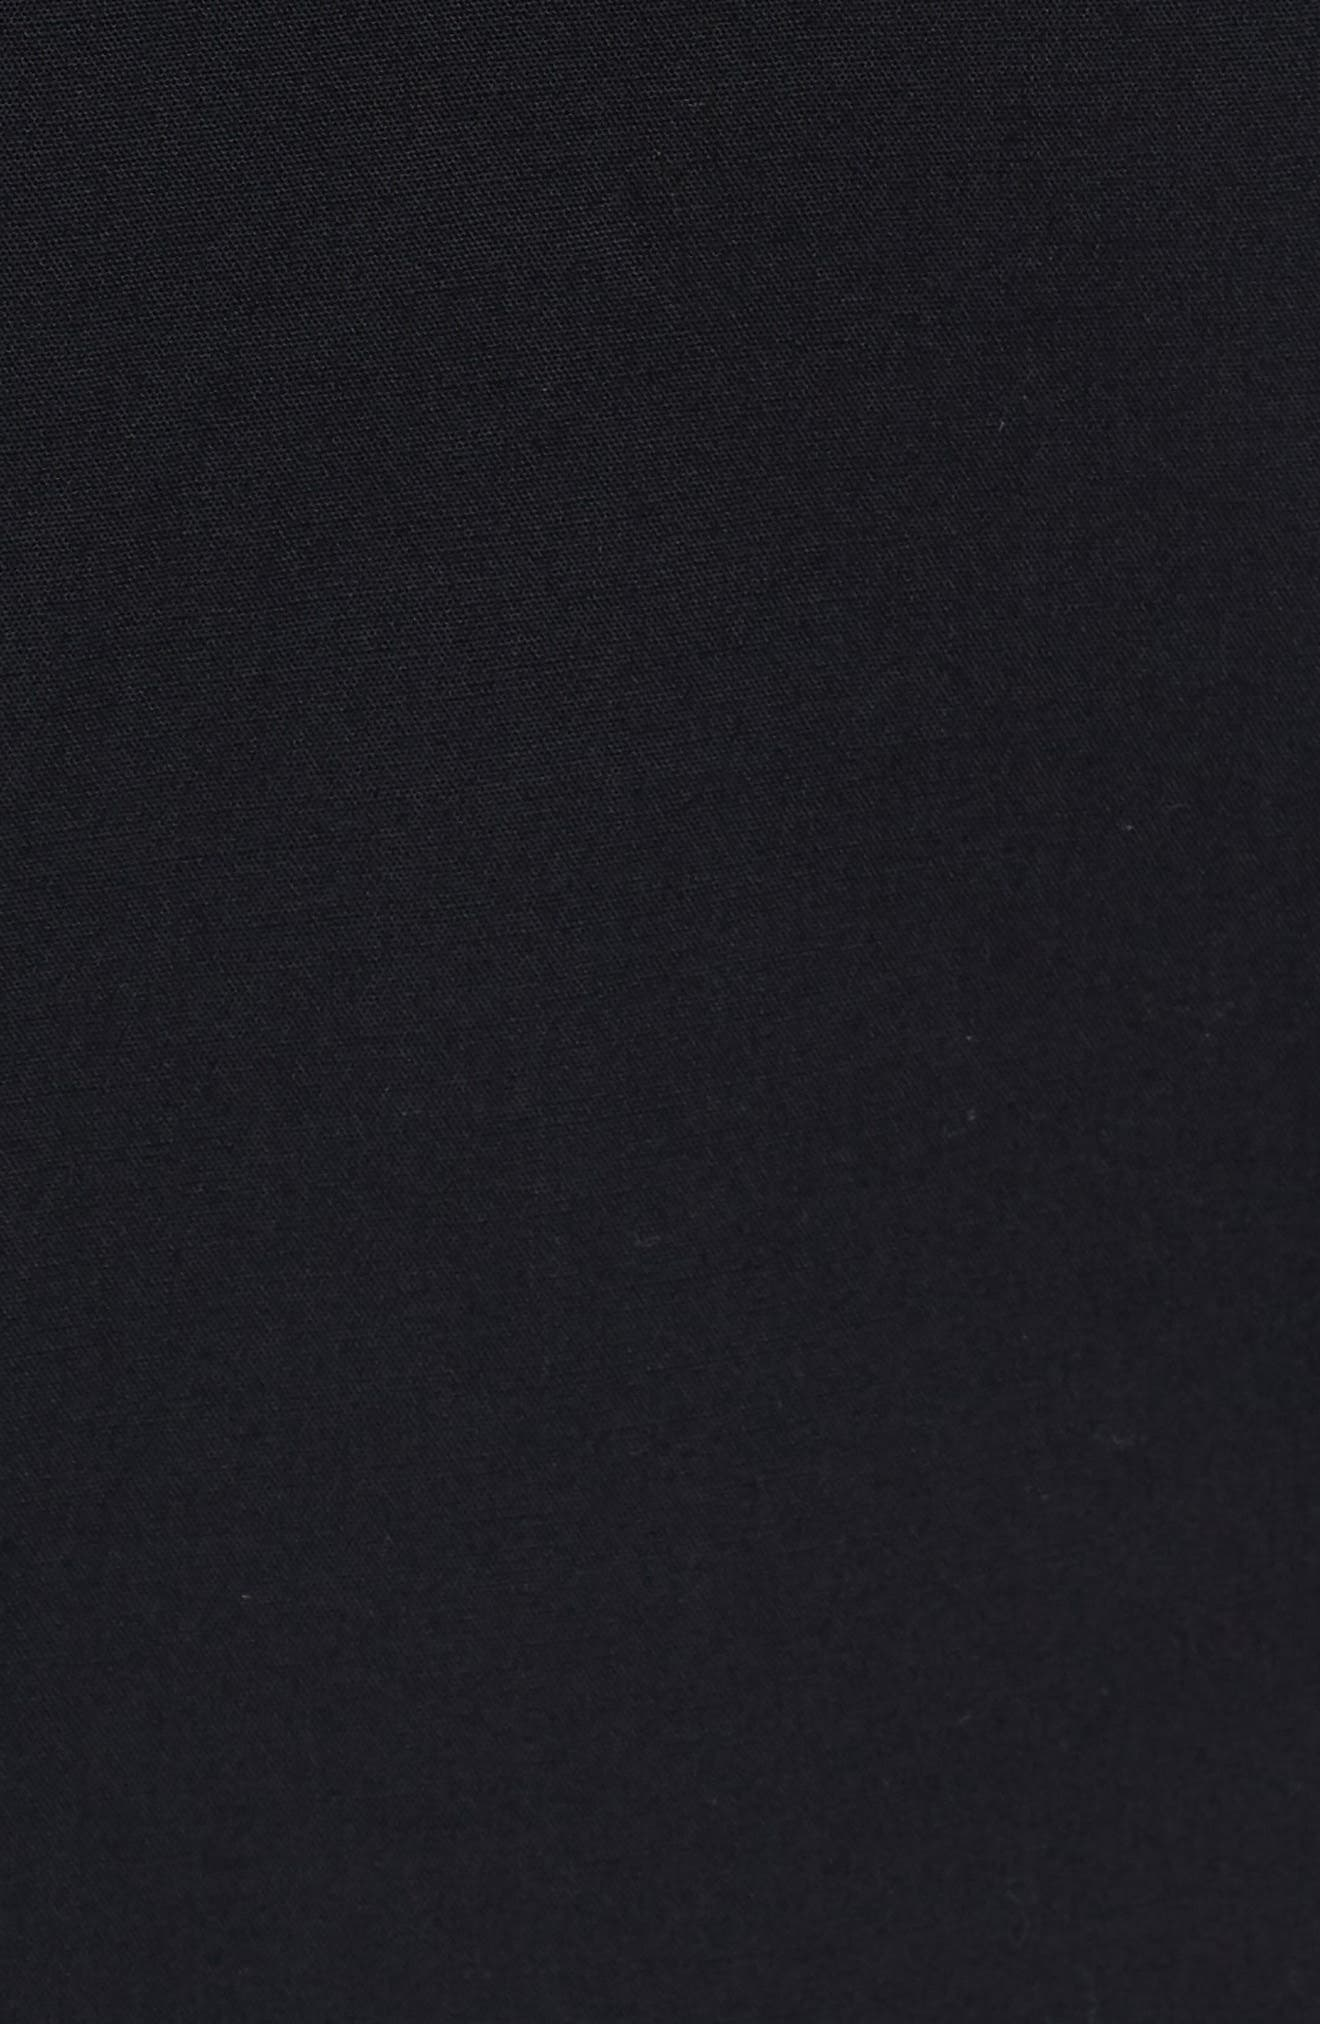 Stretch Skinny Fit Shirt,                             Alternate thumbnail 5, color,                             Black